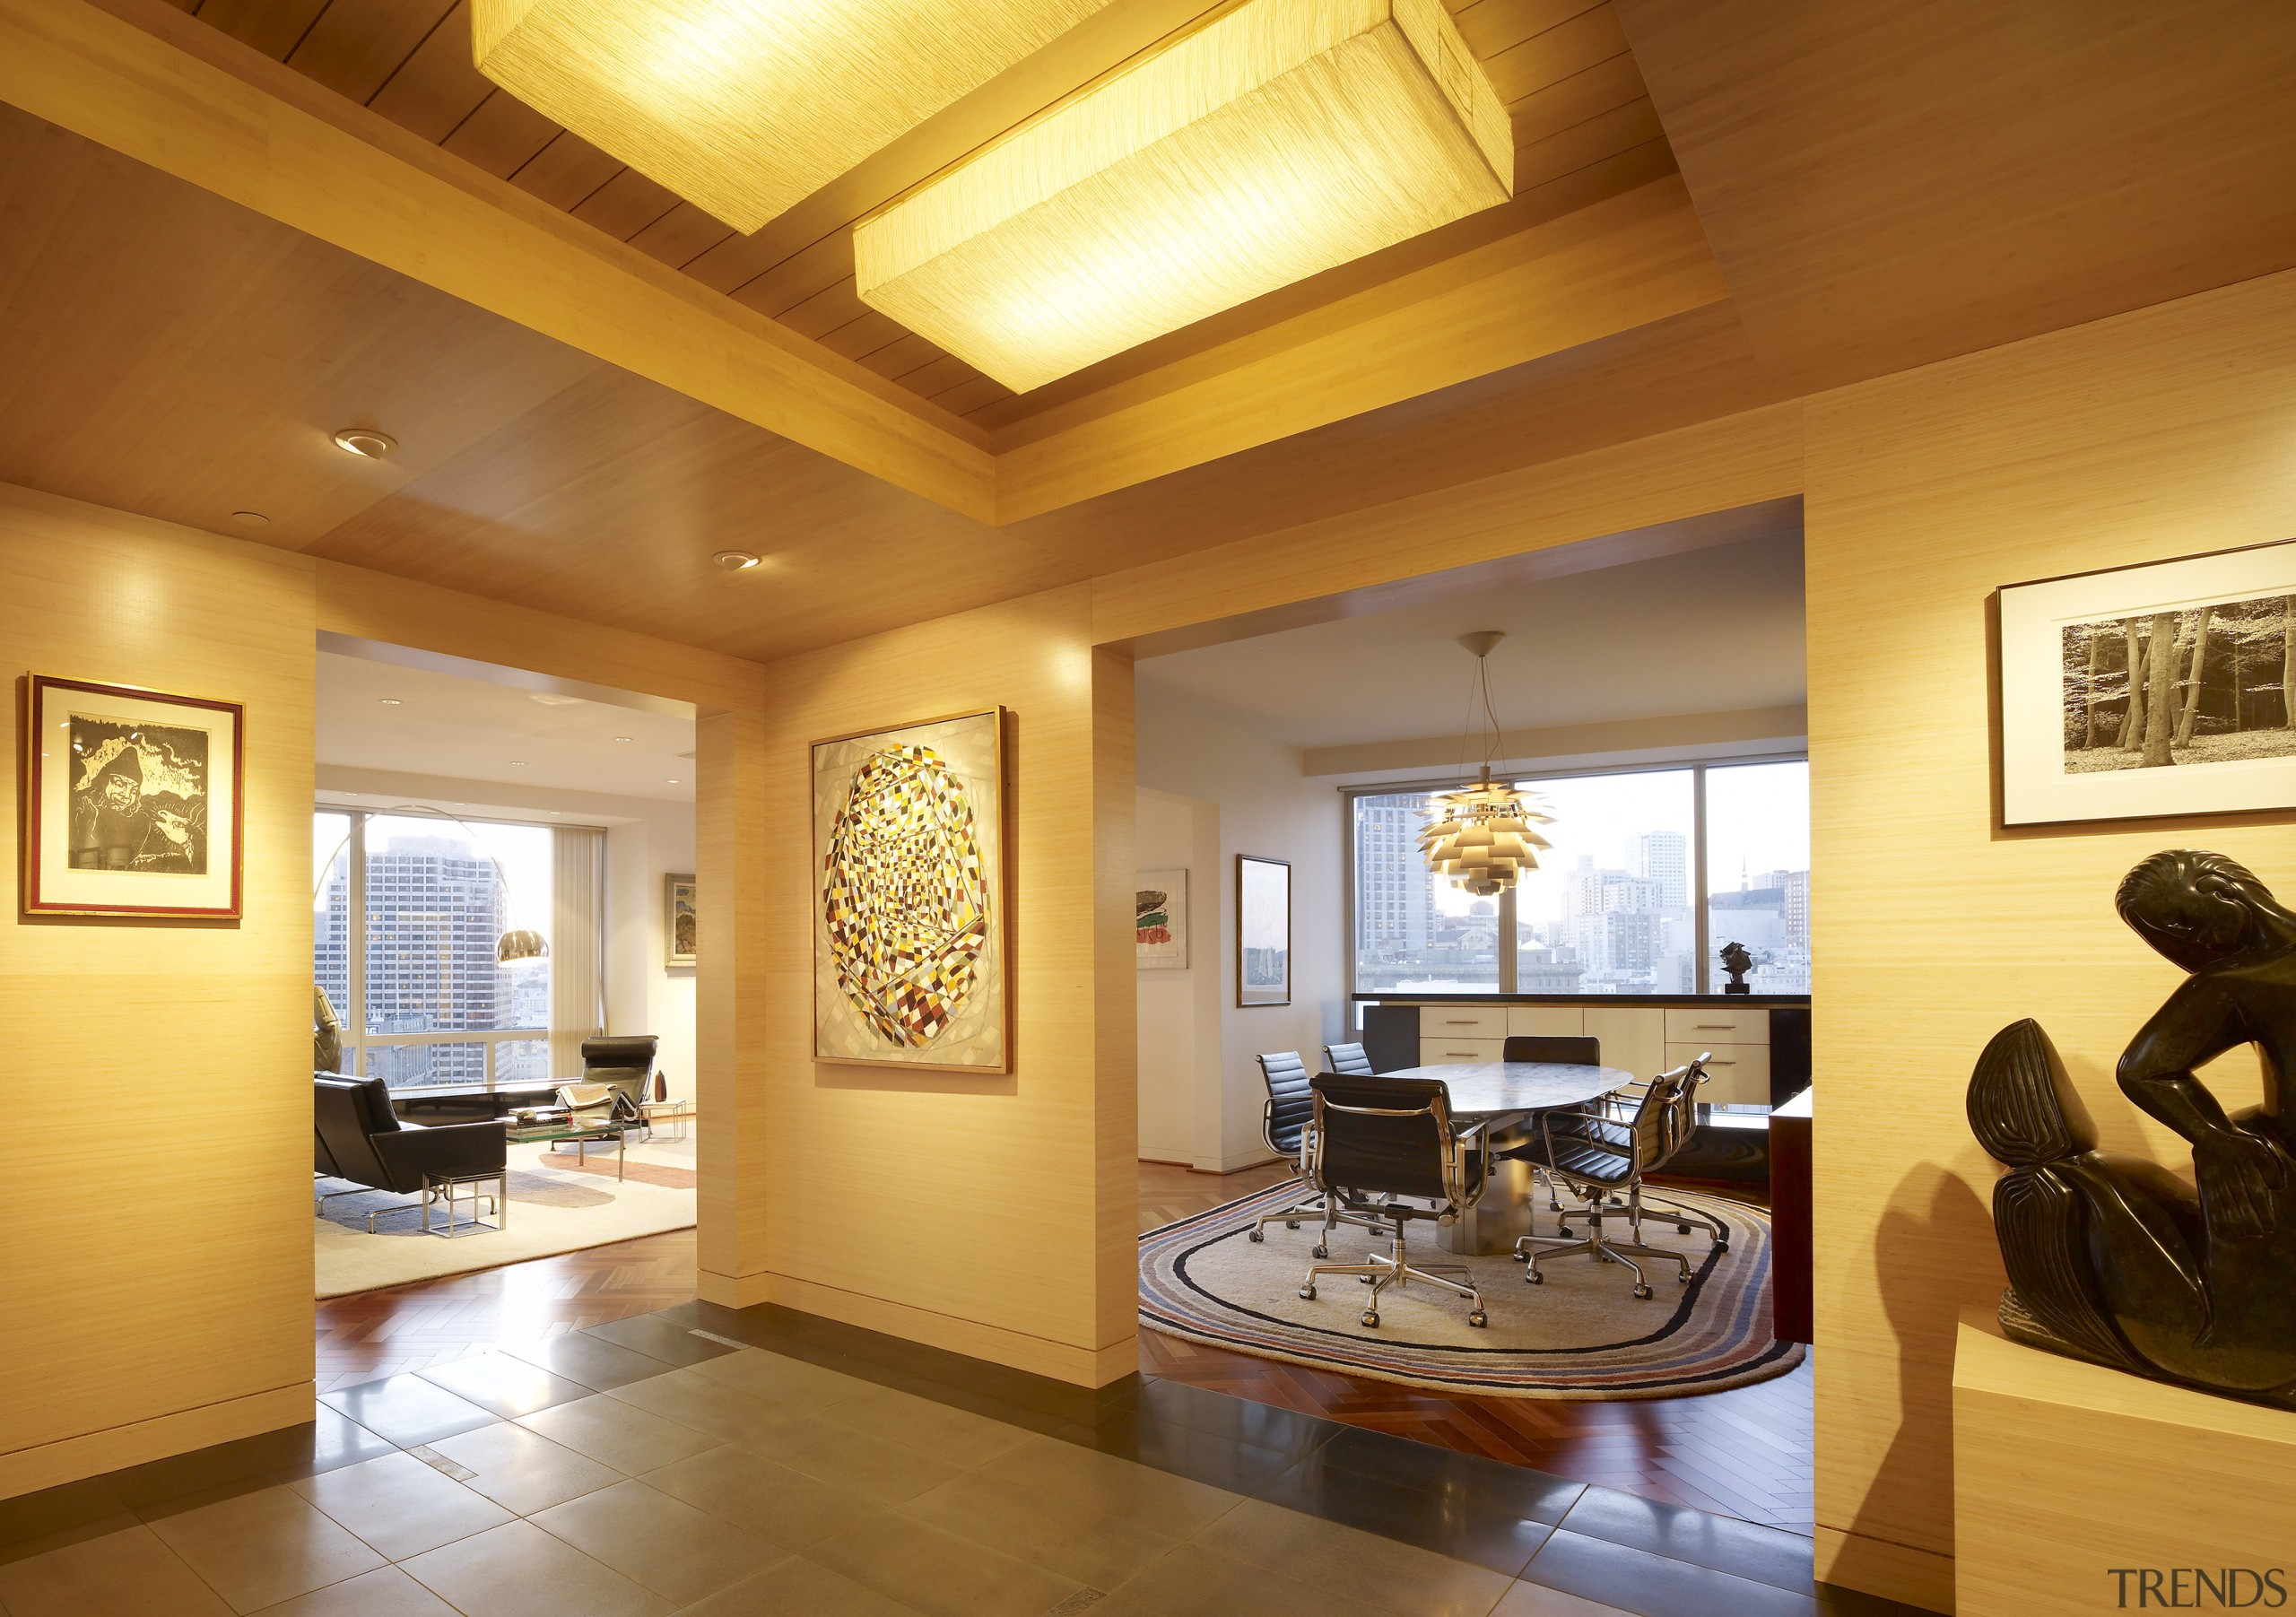 View of a remodeled kitchen with platinum grey ceiling, estate, floor, flooring, hardwood, home, interior design, living room, property, real estate, room, wall, window, wood flooring, orange, brown